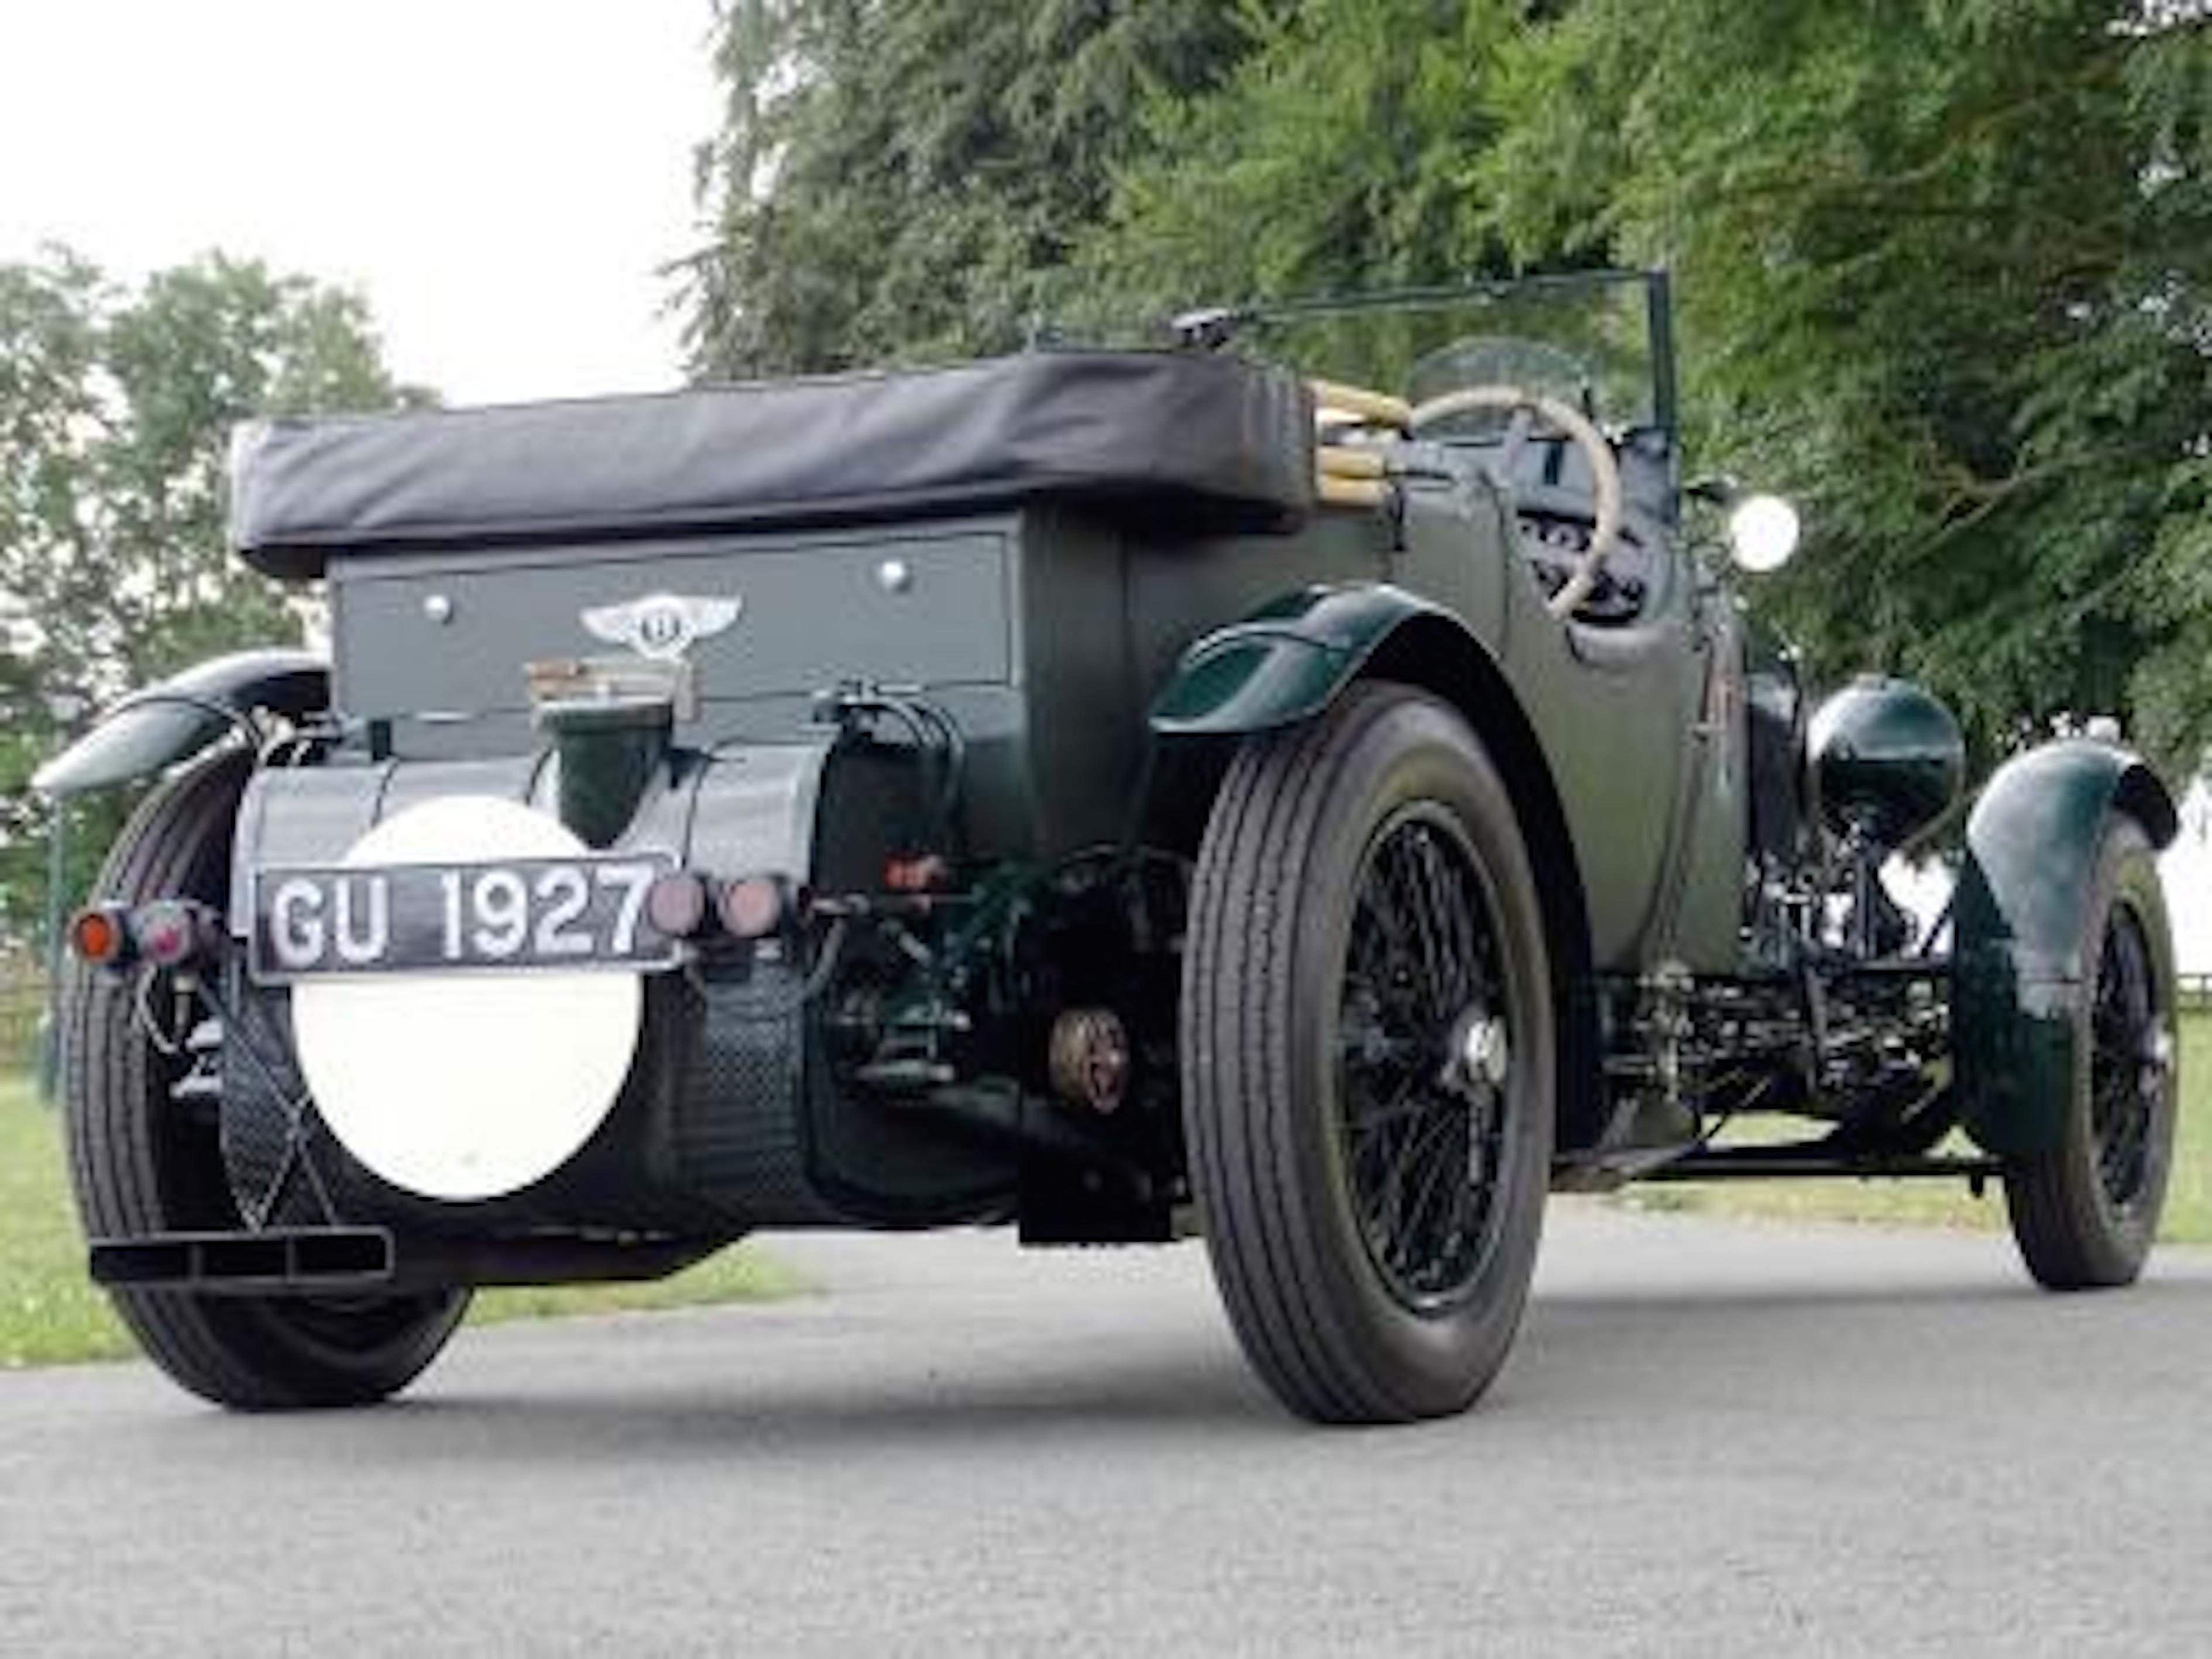 Bentley Boys, Best of the Bentley Boys' 1929 Bentley headed to auction, ClassicCars.com Journal